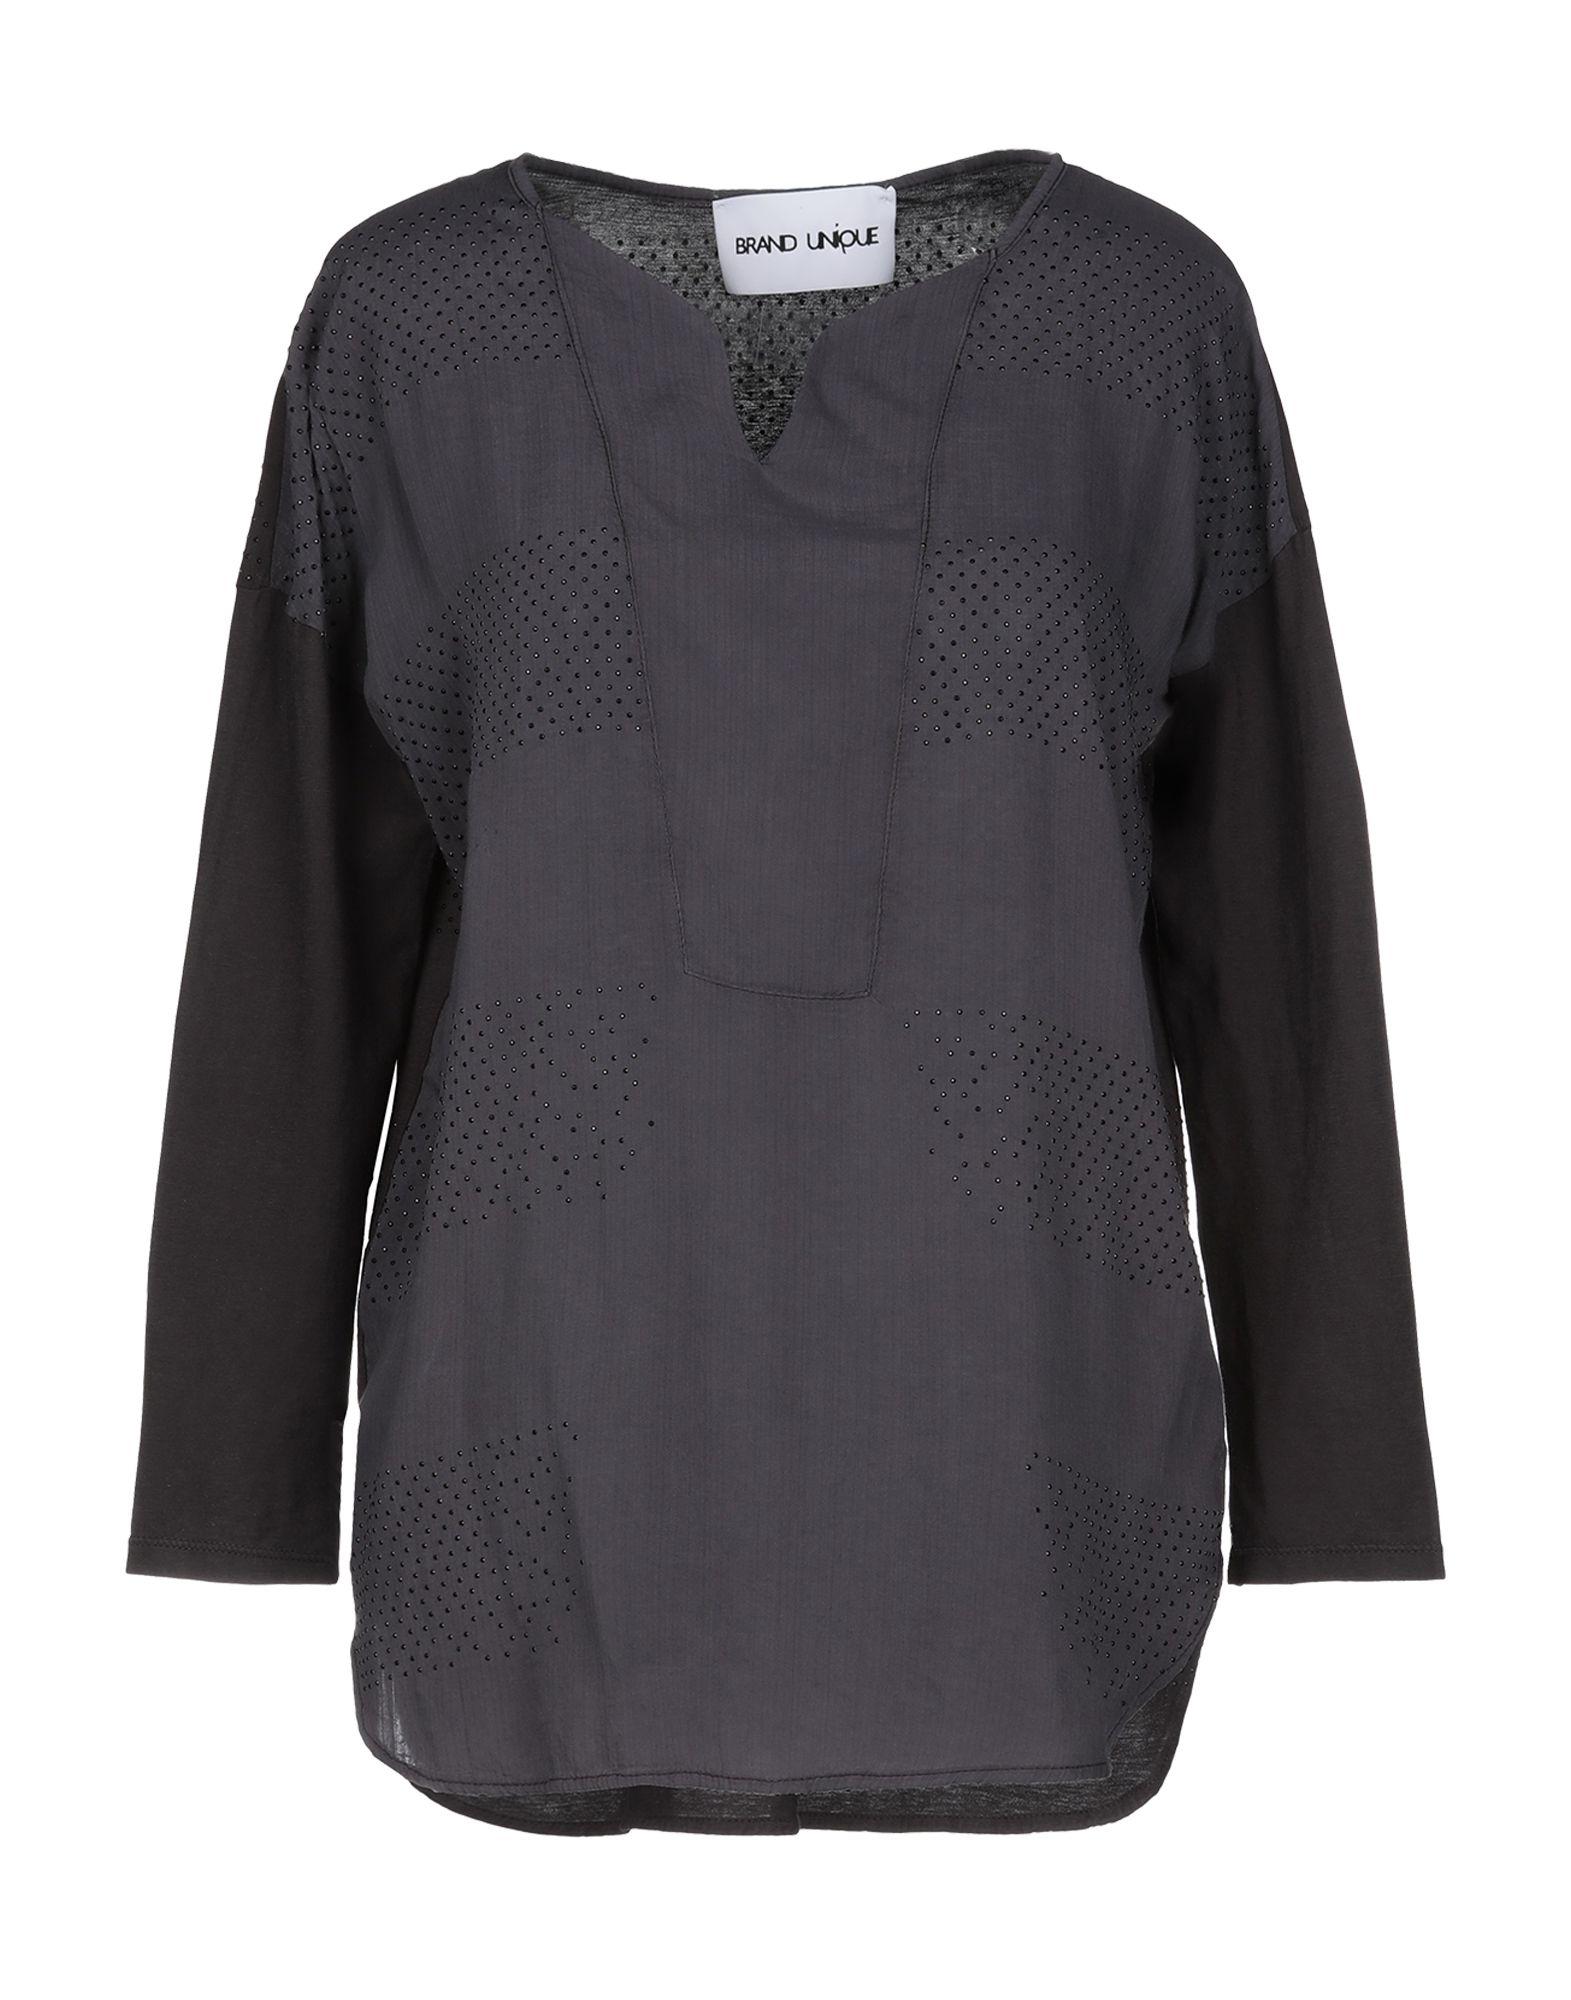 BRAND UNIQUE Блузка brand unique блузка